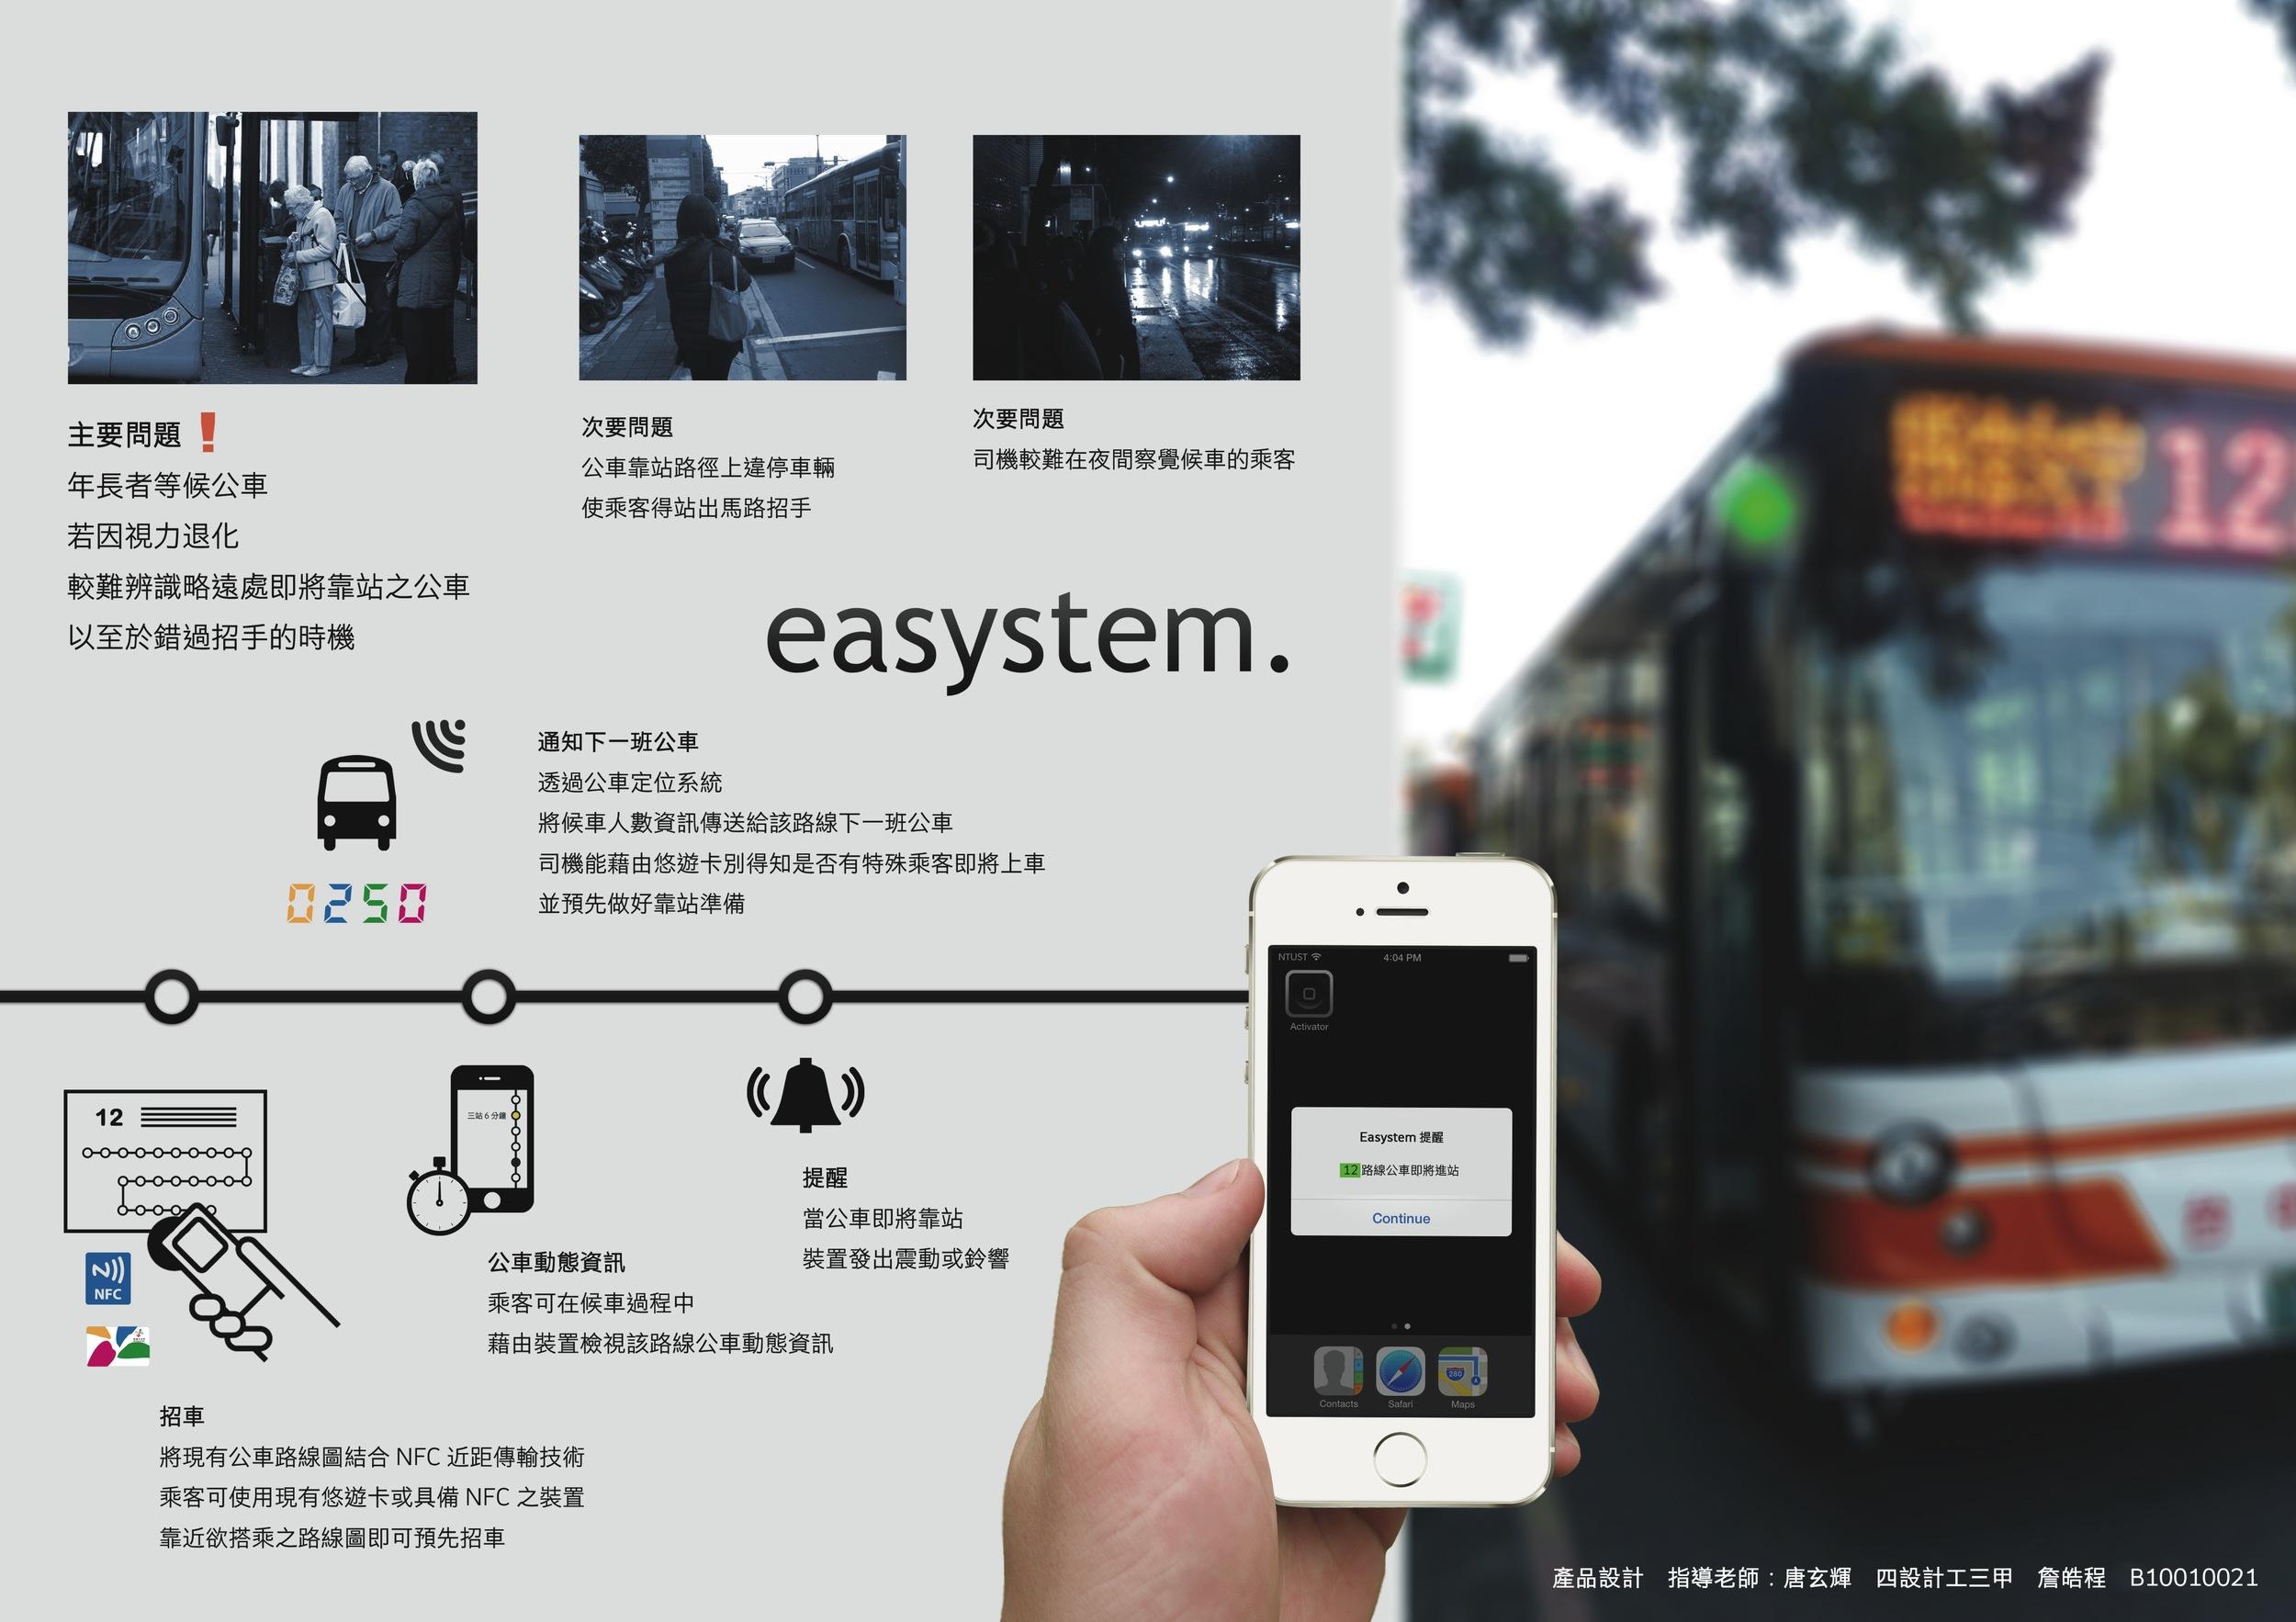 * 詹皓程_Easystem.jpg